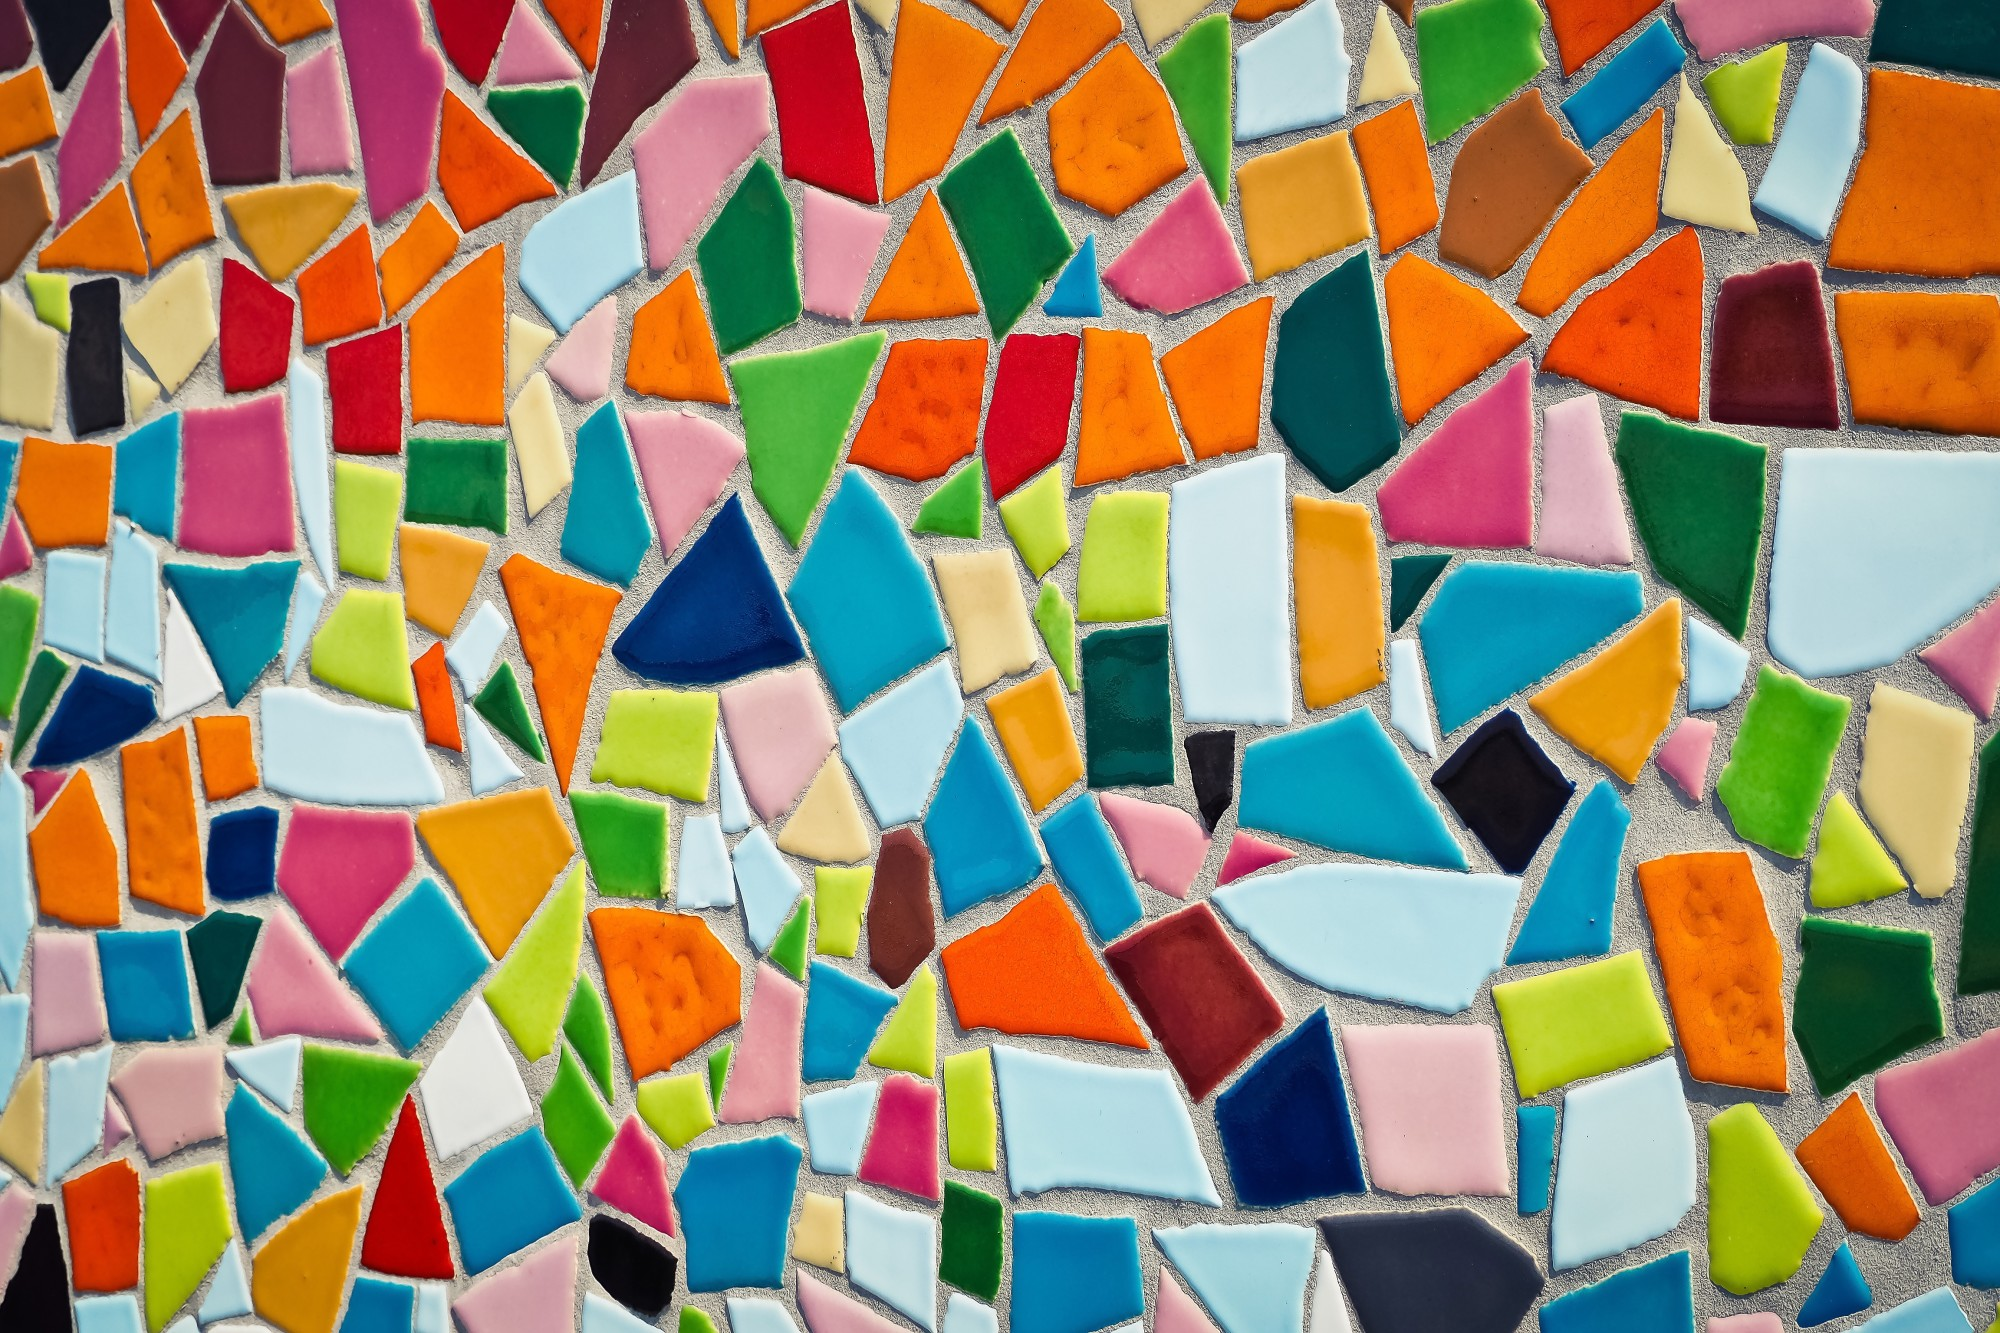 Custom Pool Ideas: Mosaic Designs and Tiles